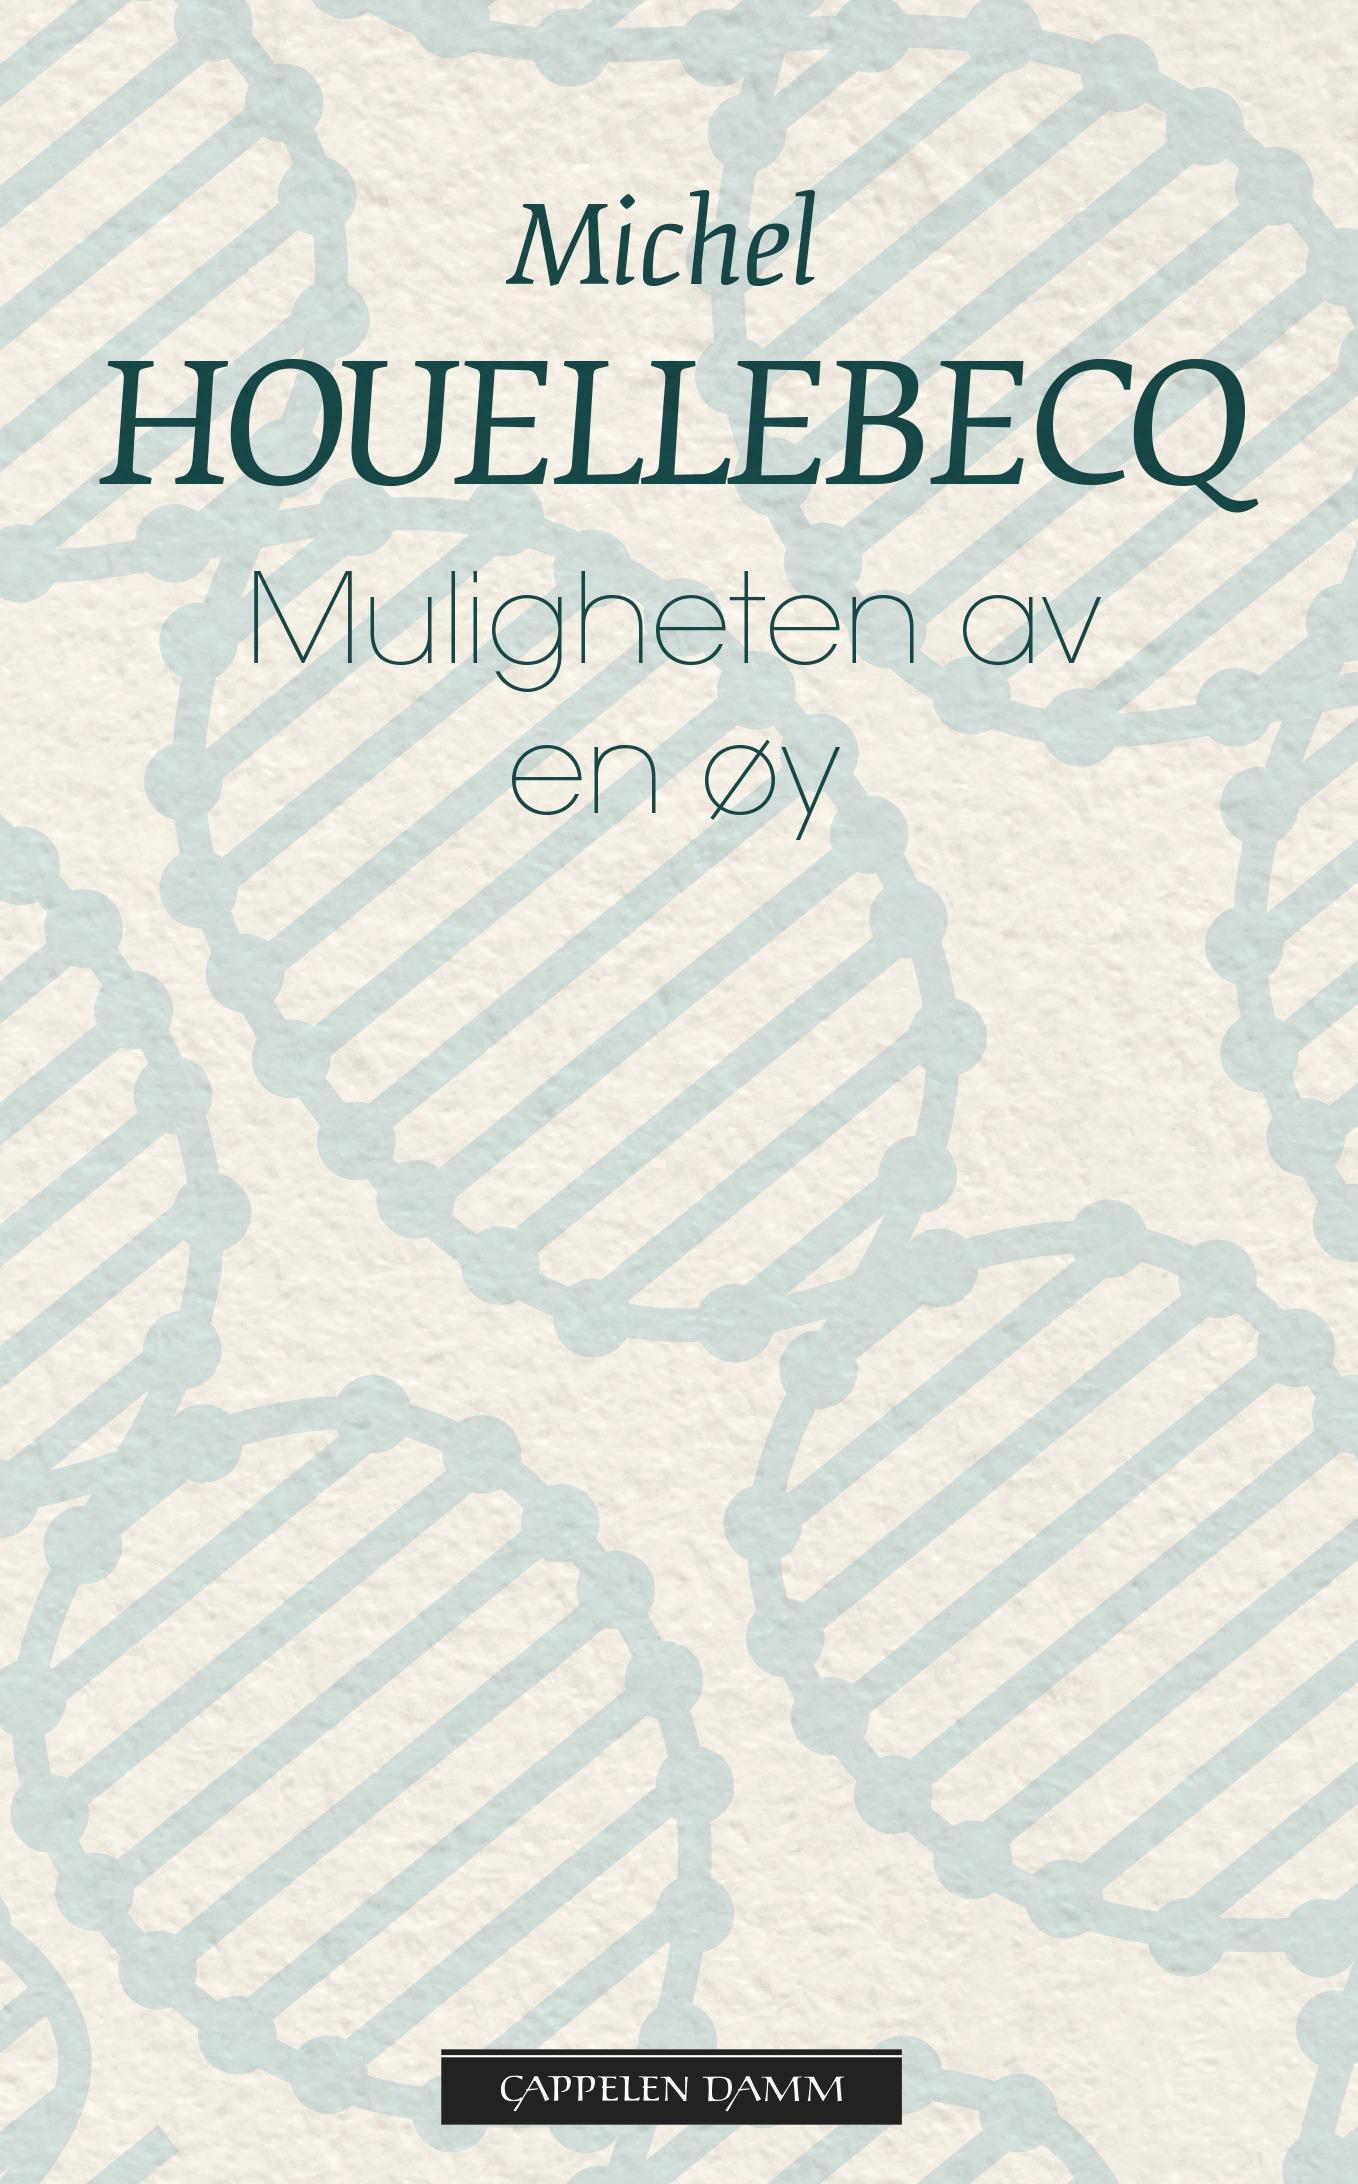 """Muligheten av en øy"" av Michel Houellebecq"